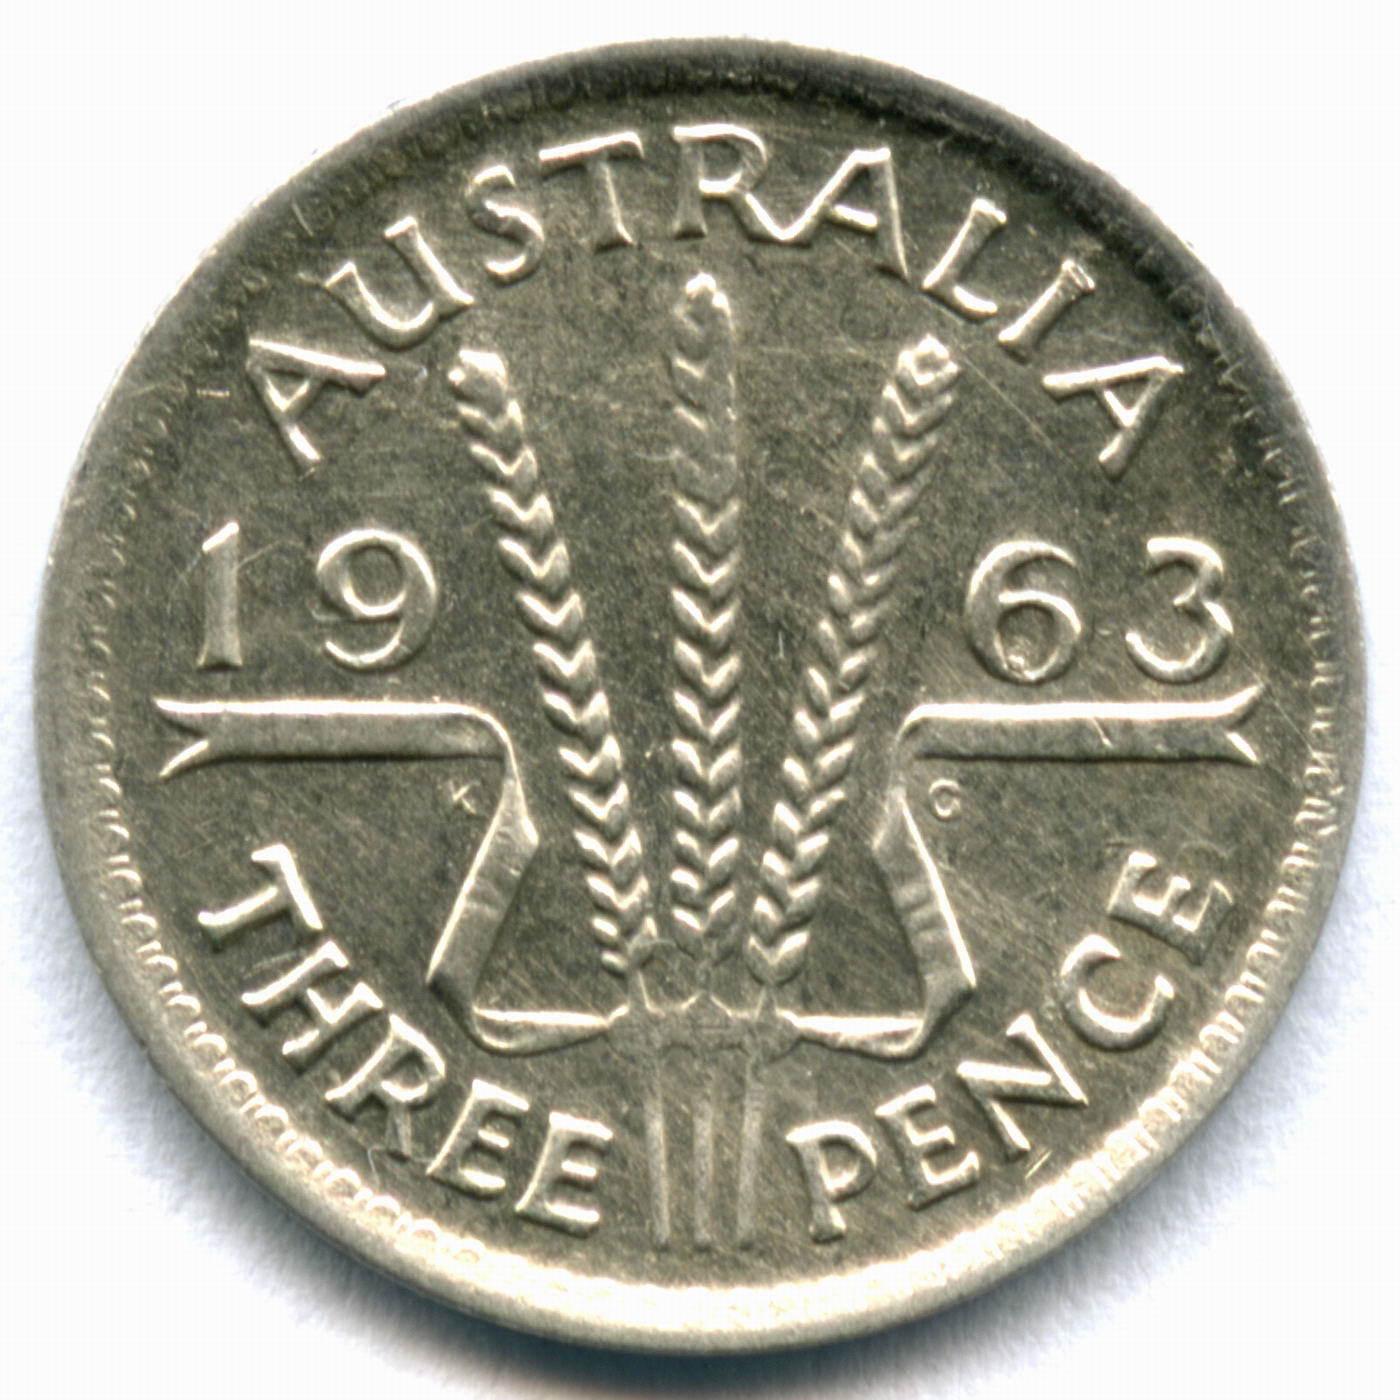 3 пенса 1963. Австралия. VF. Серебро